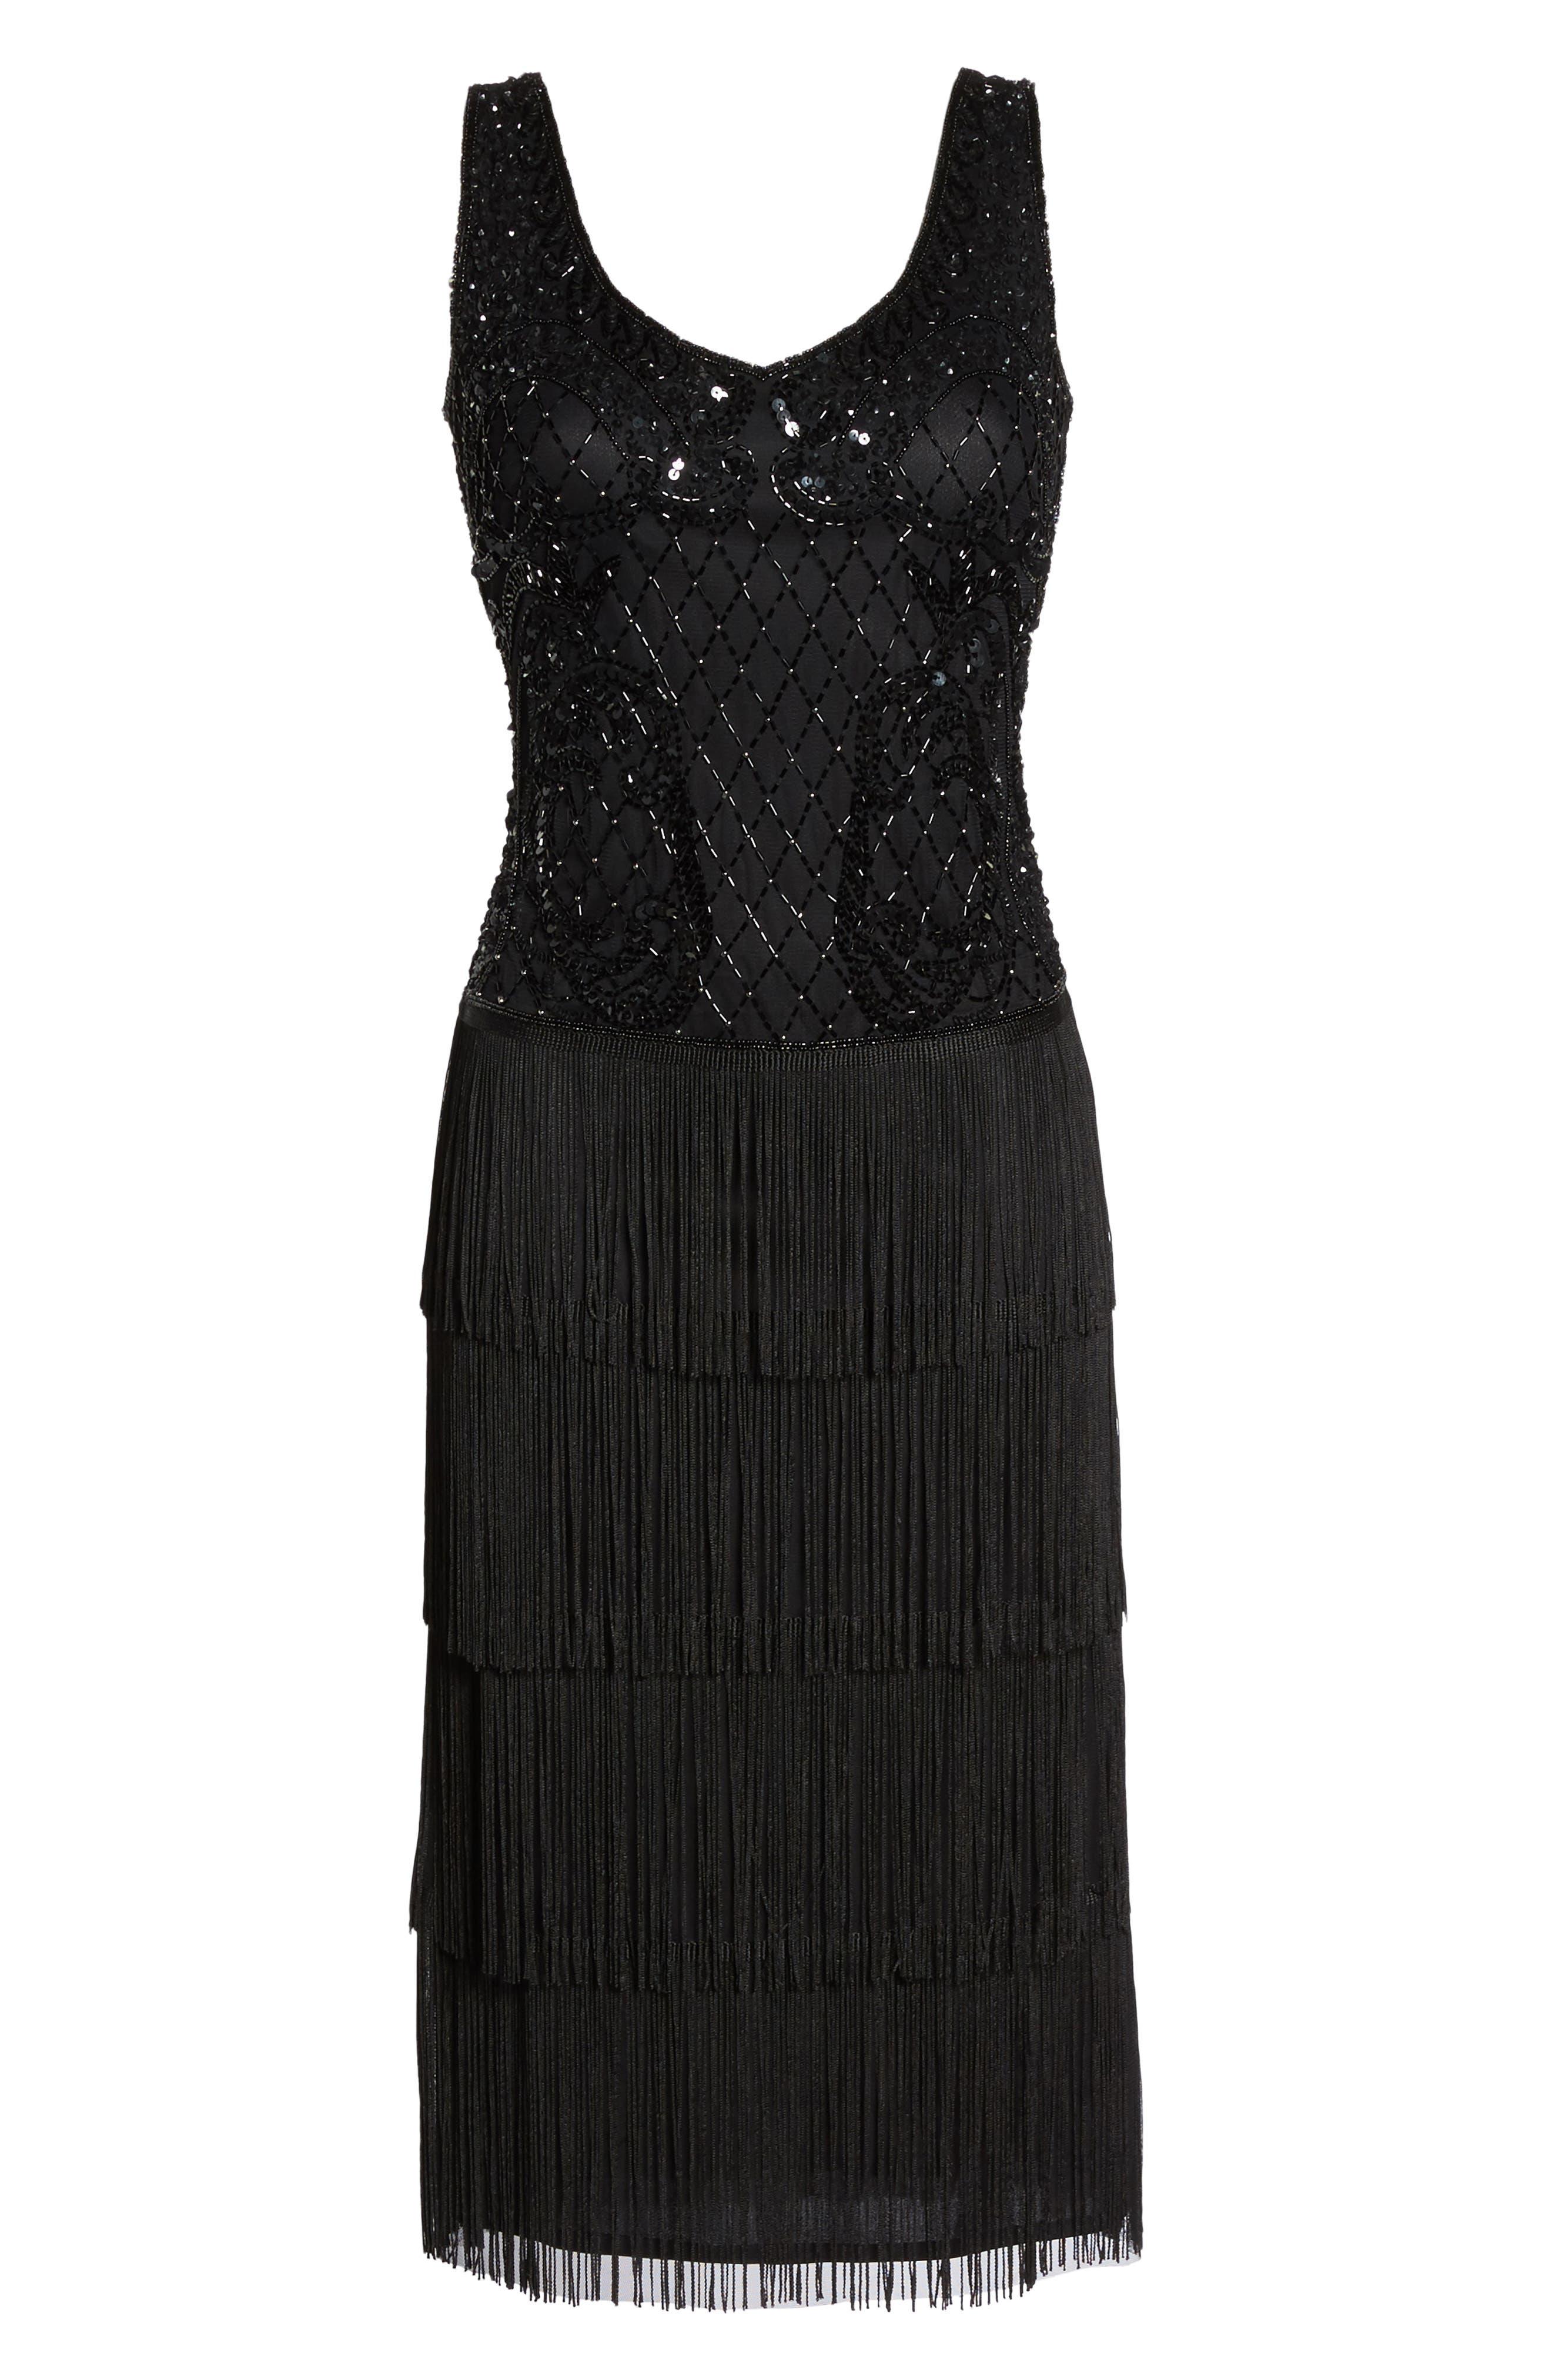 Embellished Fringe Tiered Sheath Dress,                             Alternate thumbnail 6, color,                             001